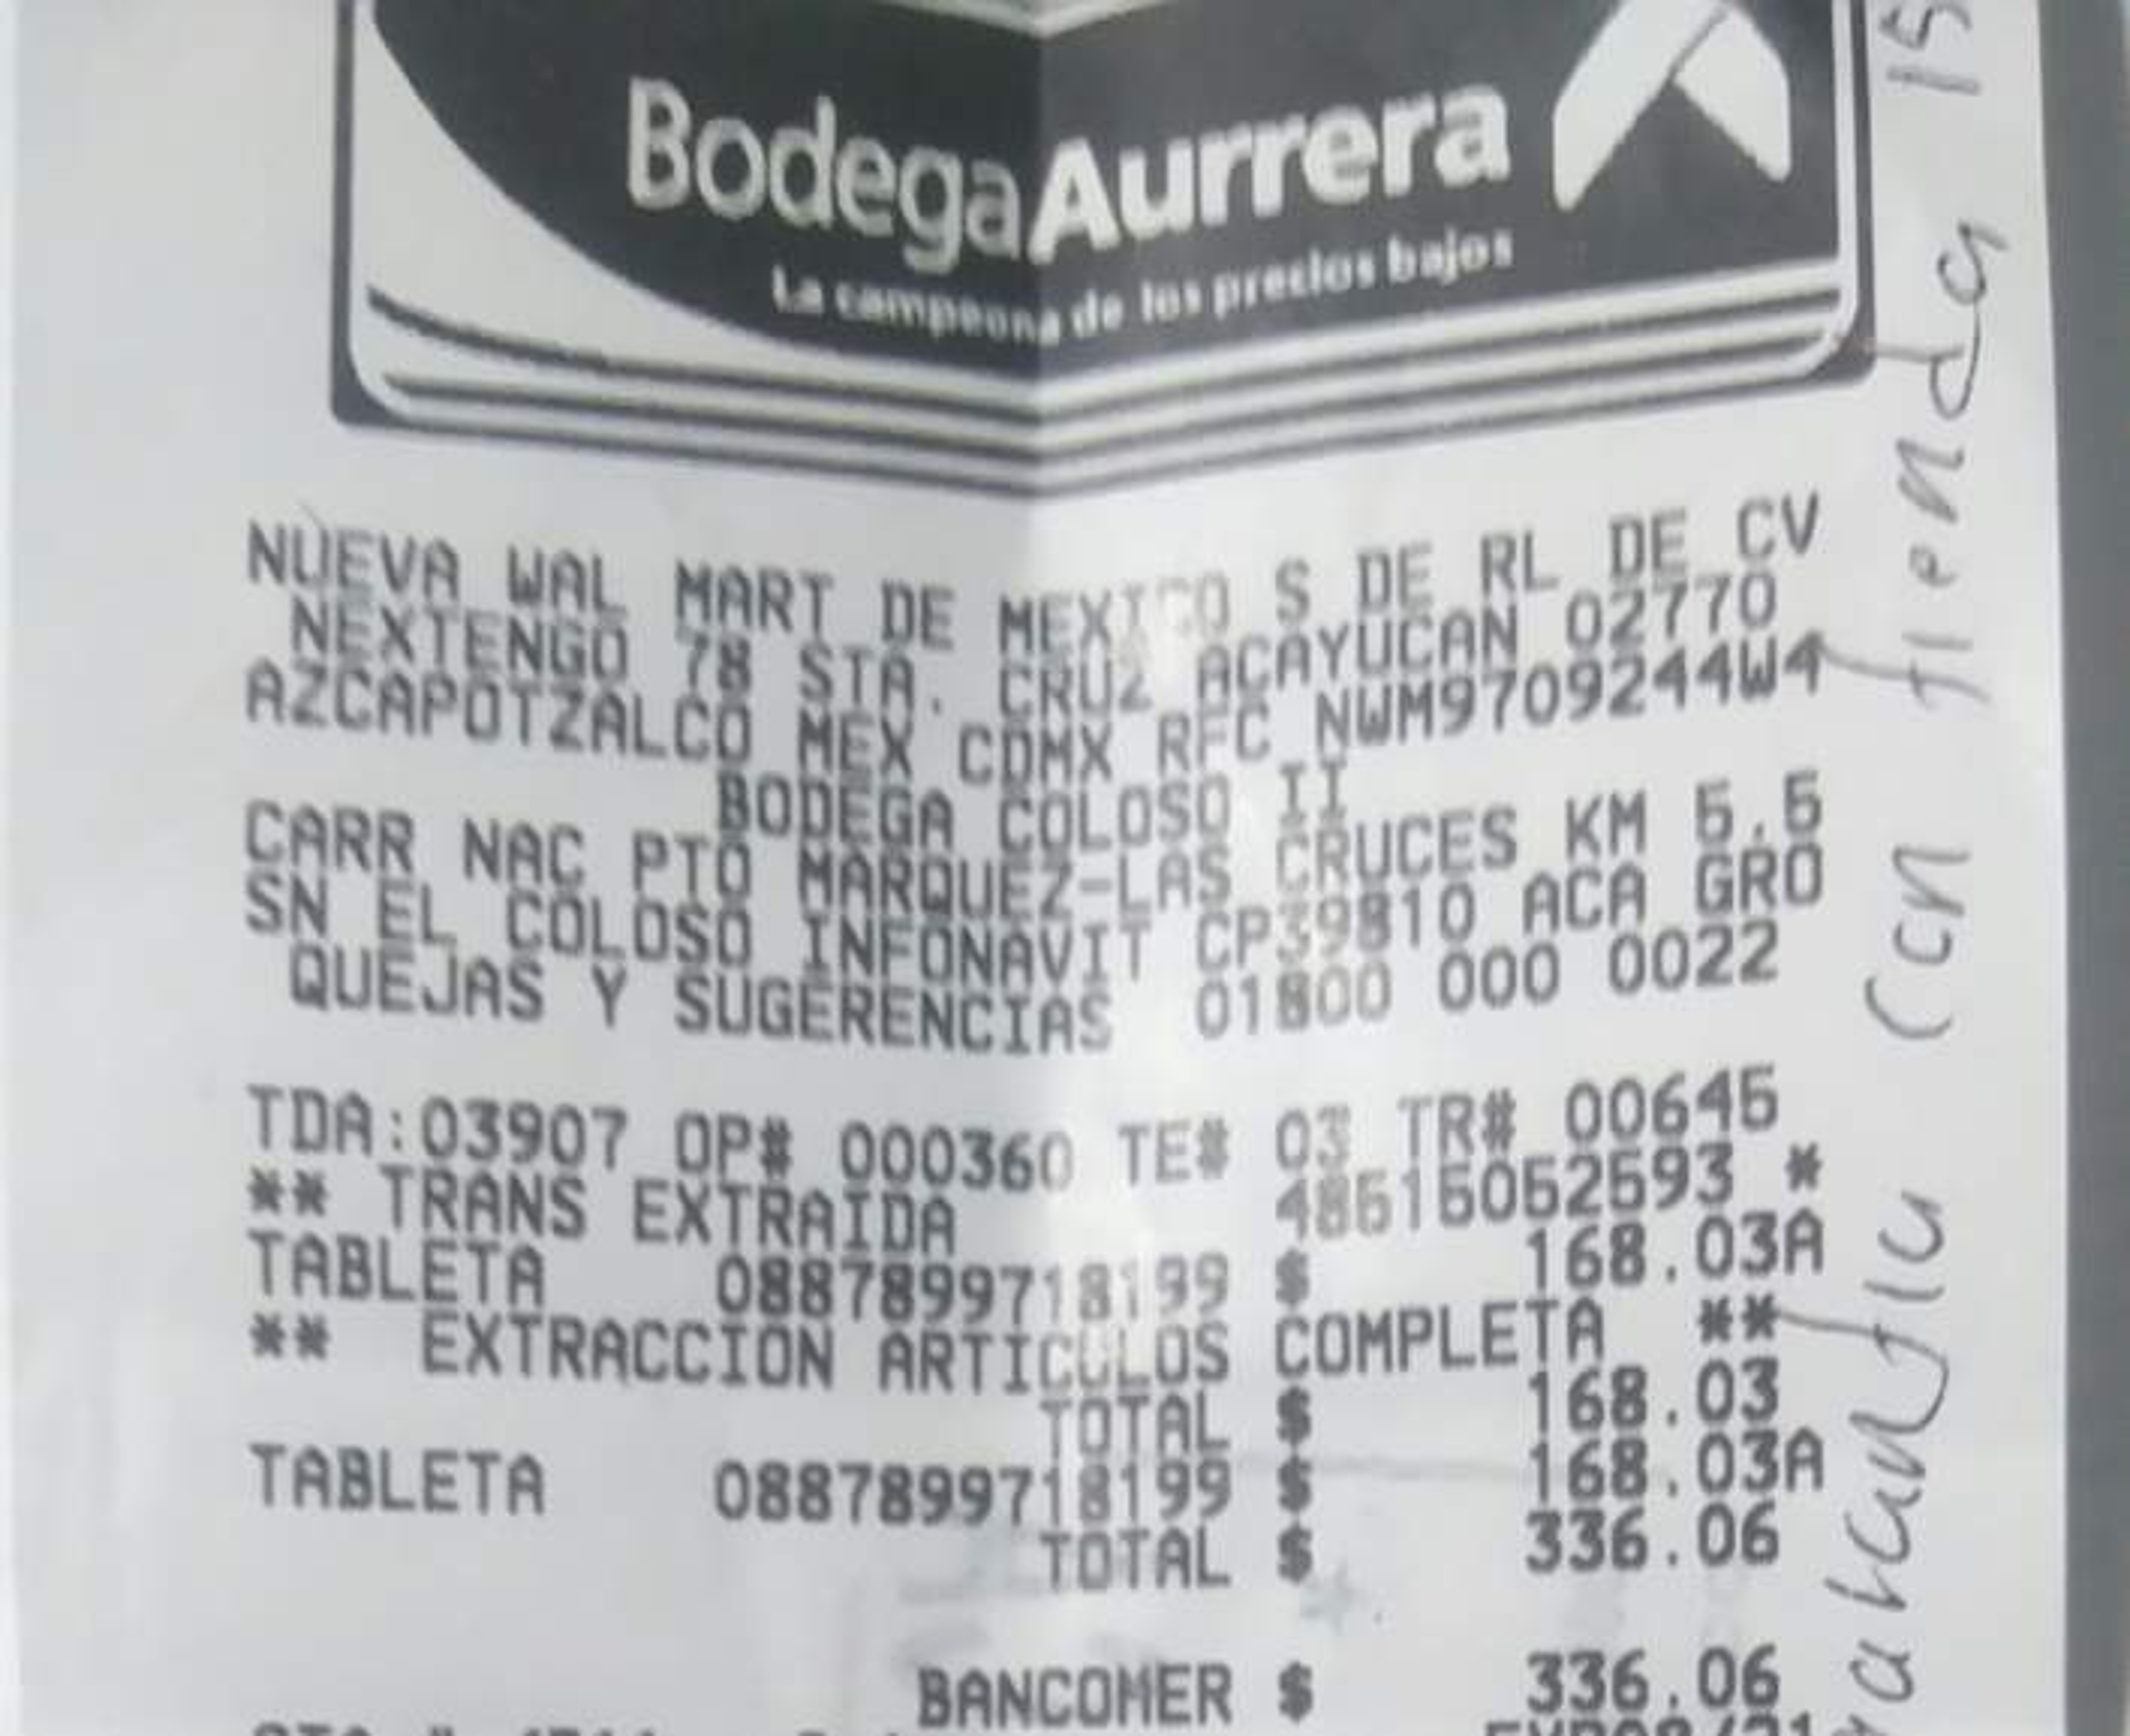 Bodega Aurrera Tablet Acer A Solo 168 03 Con Promonovela Incluida